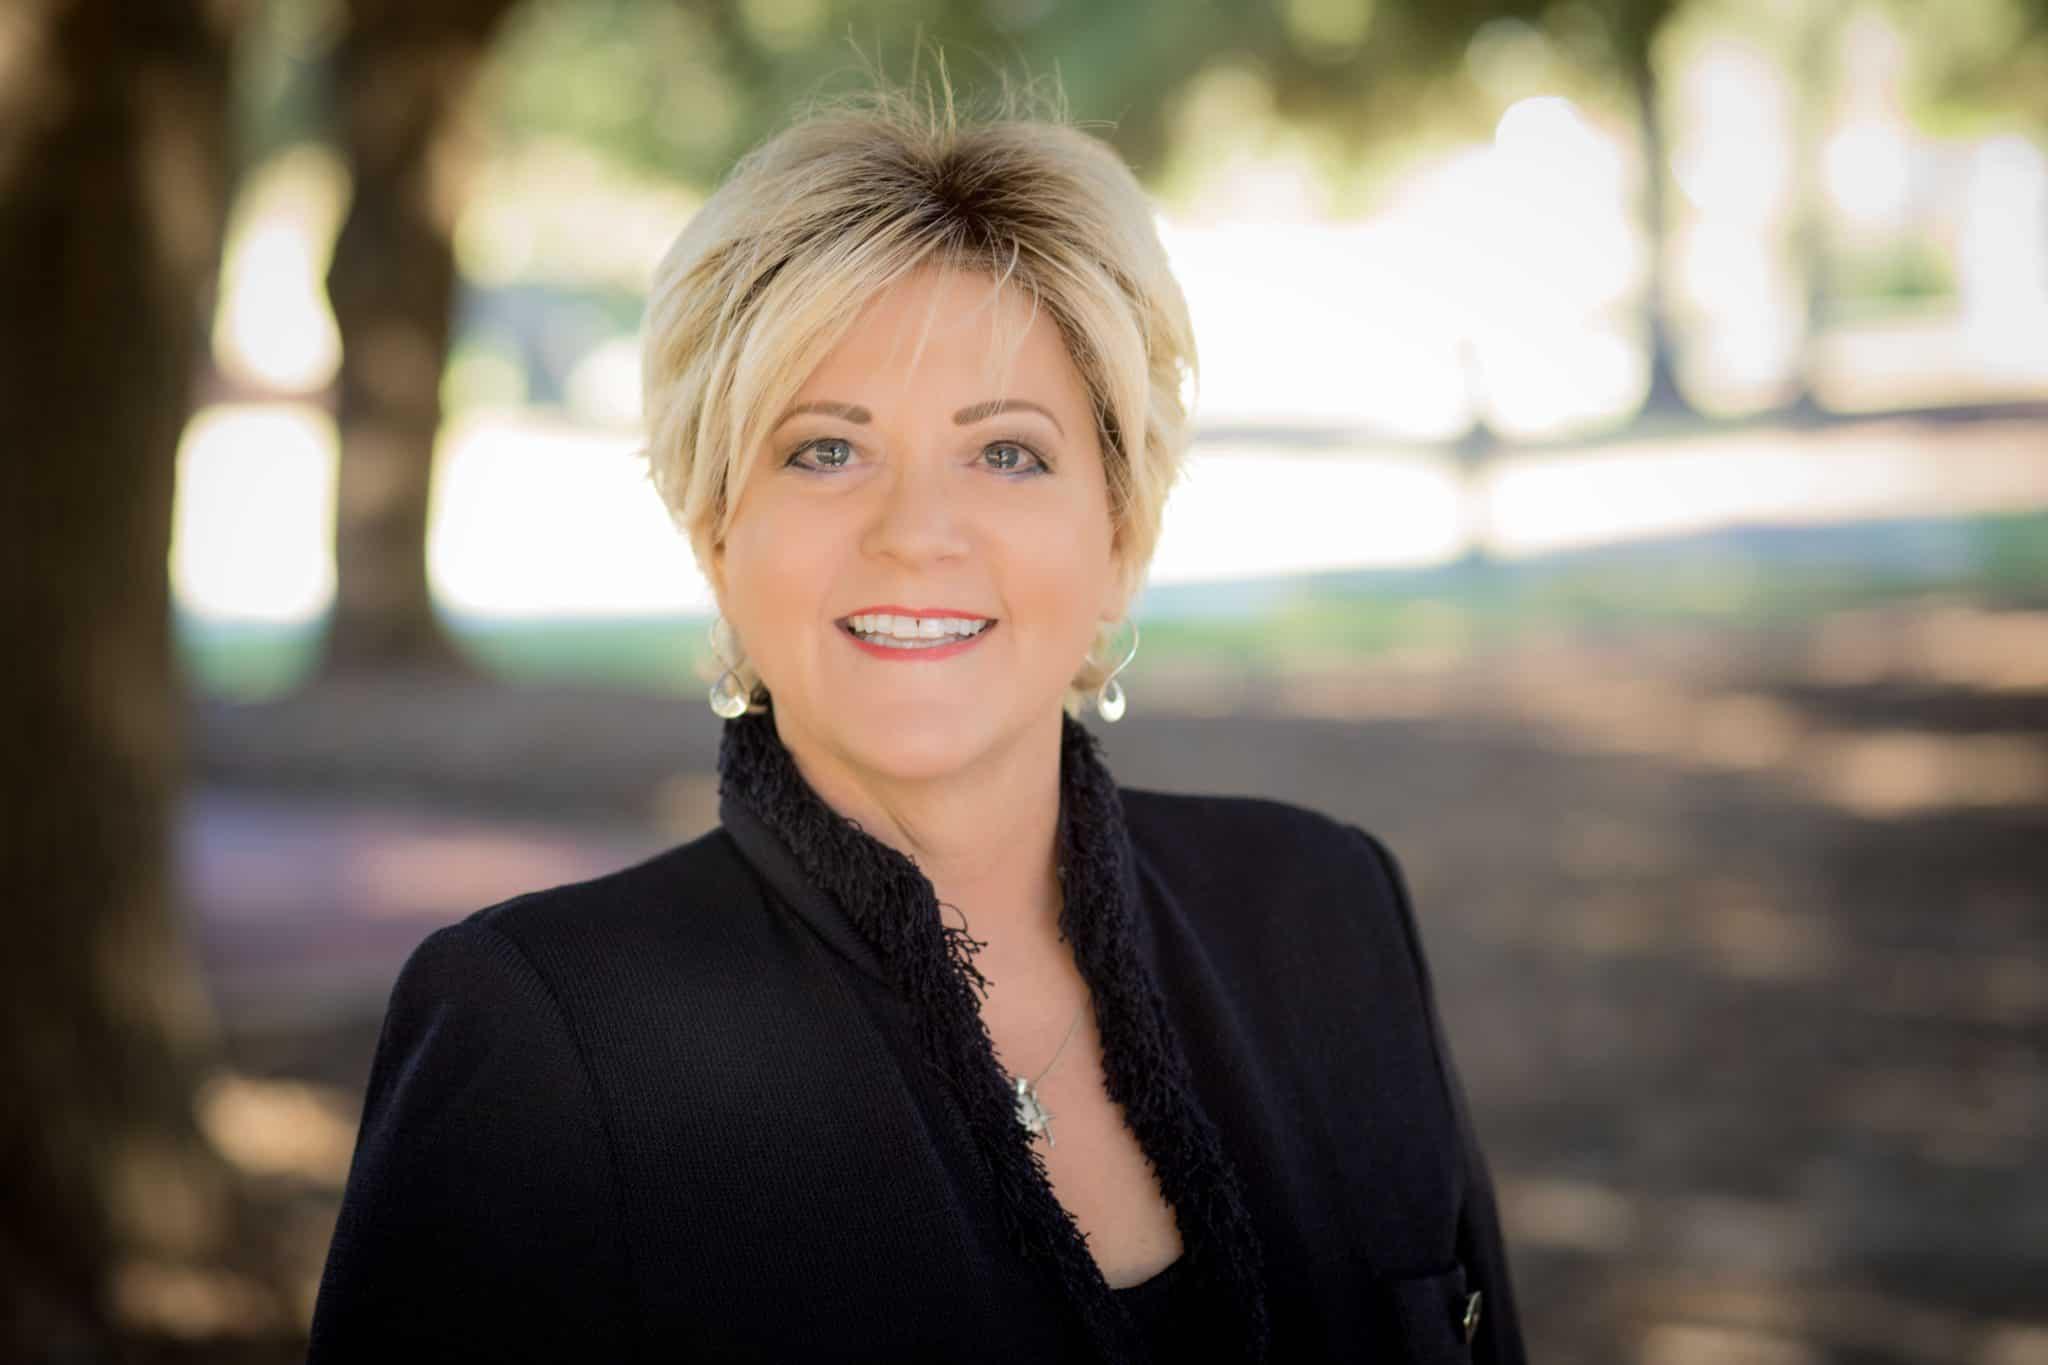 Mary Beth Sims Branham, AIA